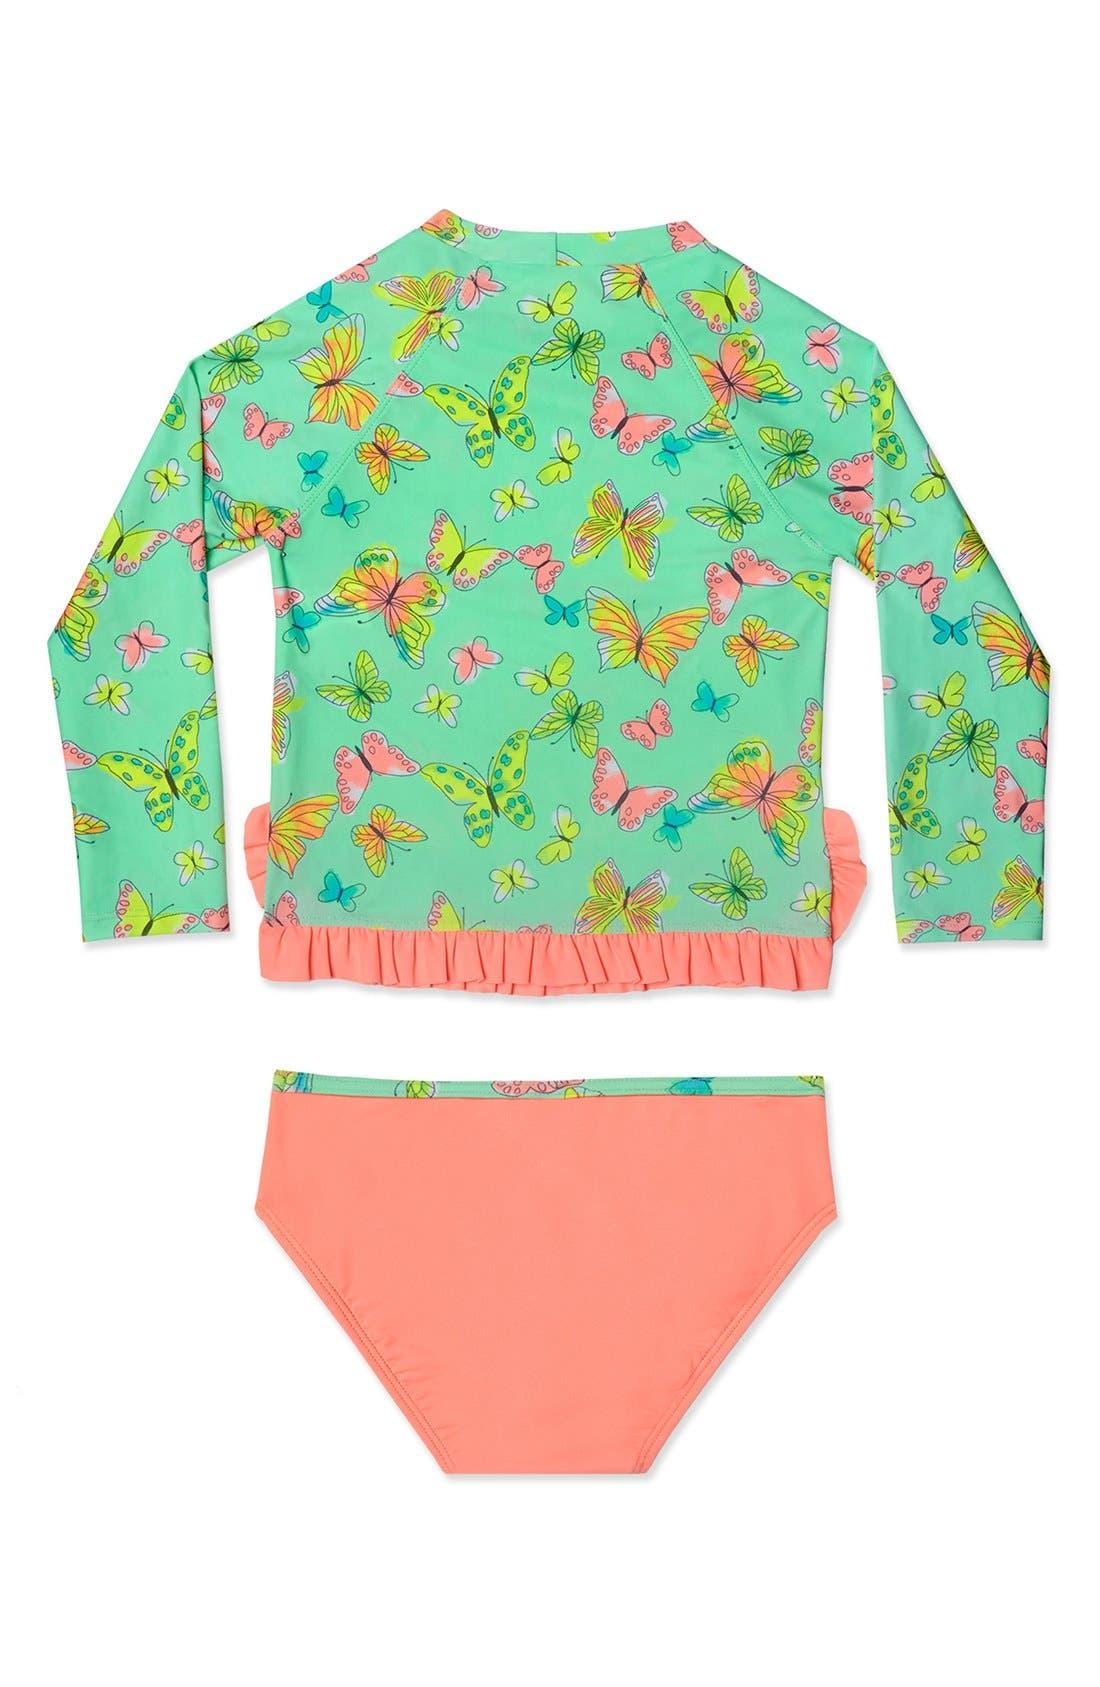 'Butterfly' Two-Piece Rashguard Swimsuit,                             Alternate thumbnail 2, color,                             Mint